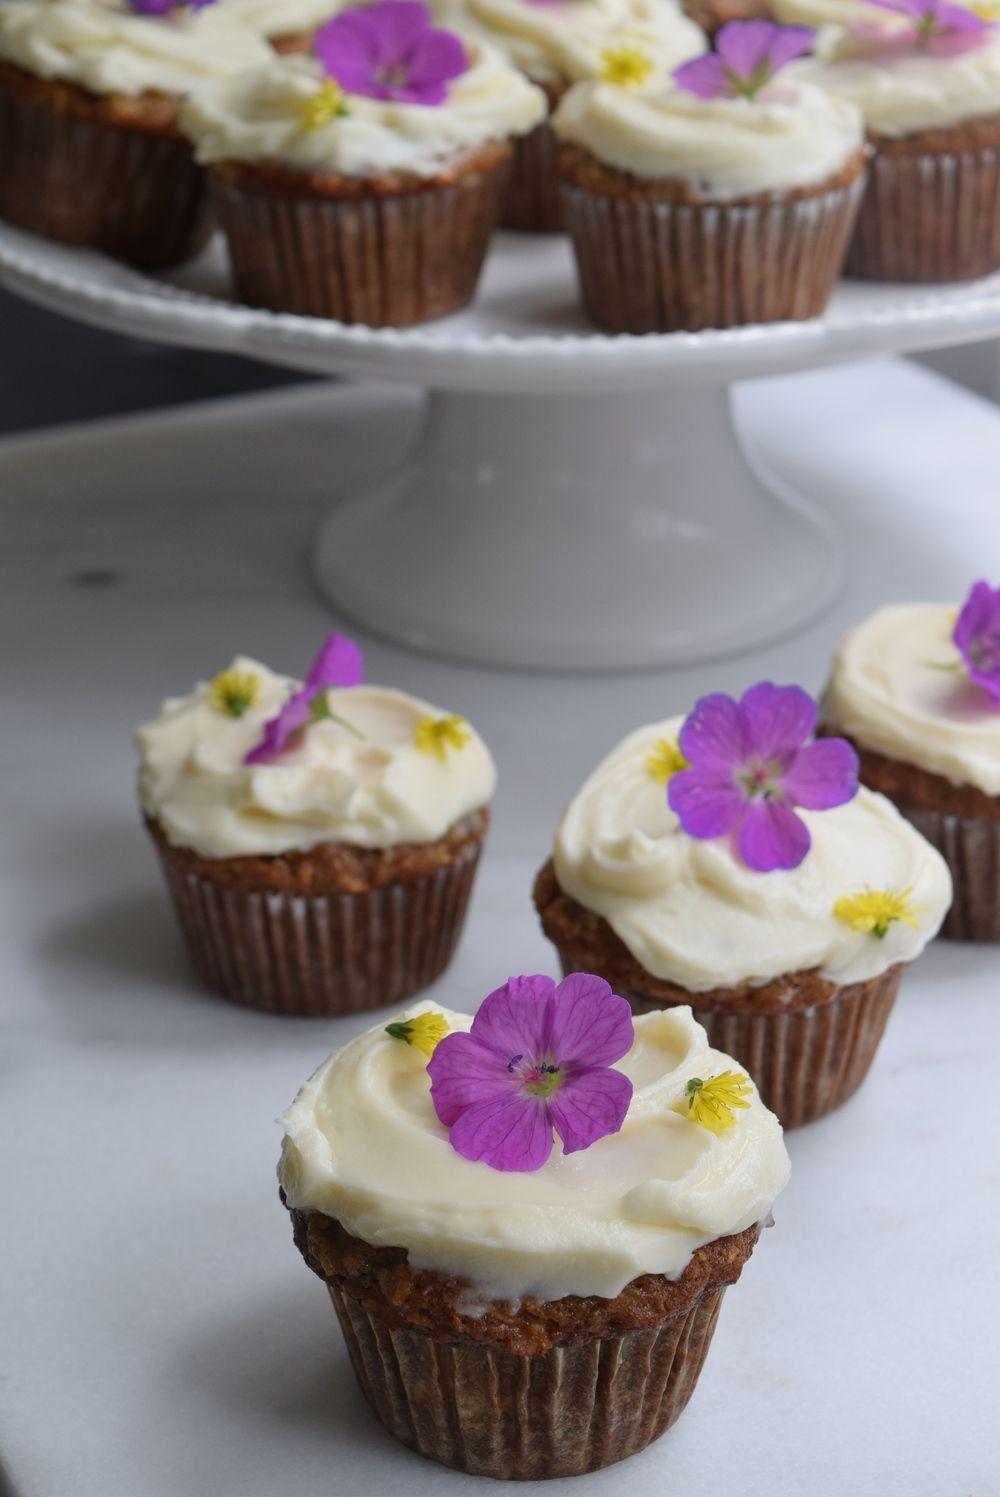 Hummingbird Cupcakes + Mascapone Frosting Hummingbird